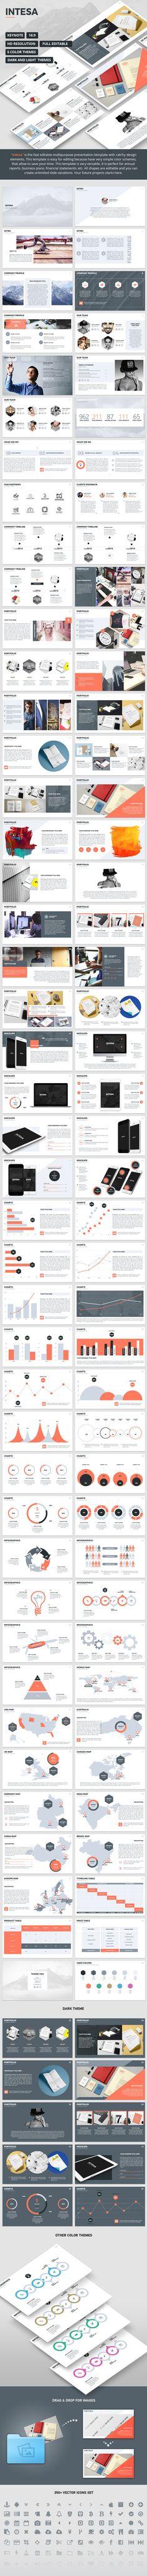 Intesa Keynote Presentation Template  #marketing #startup • Download ➝ https://graphicriver.net/item/intesa-keynote-presentation-template/15107322?ref=pxcr